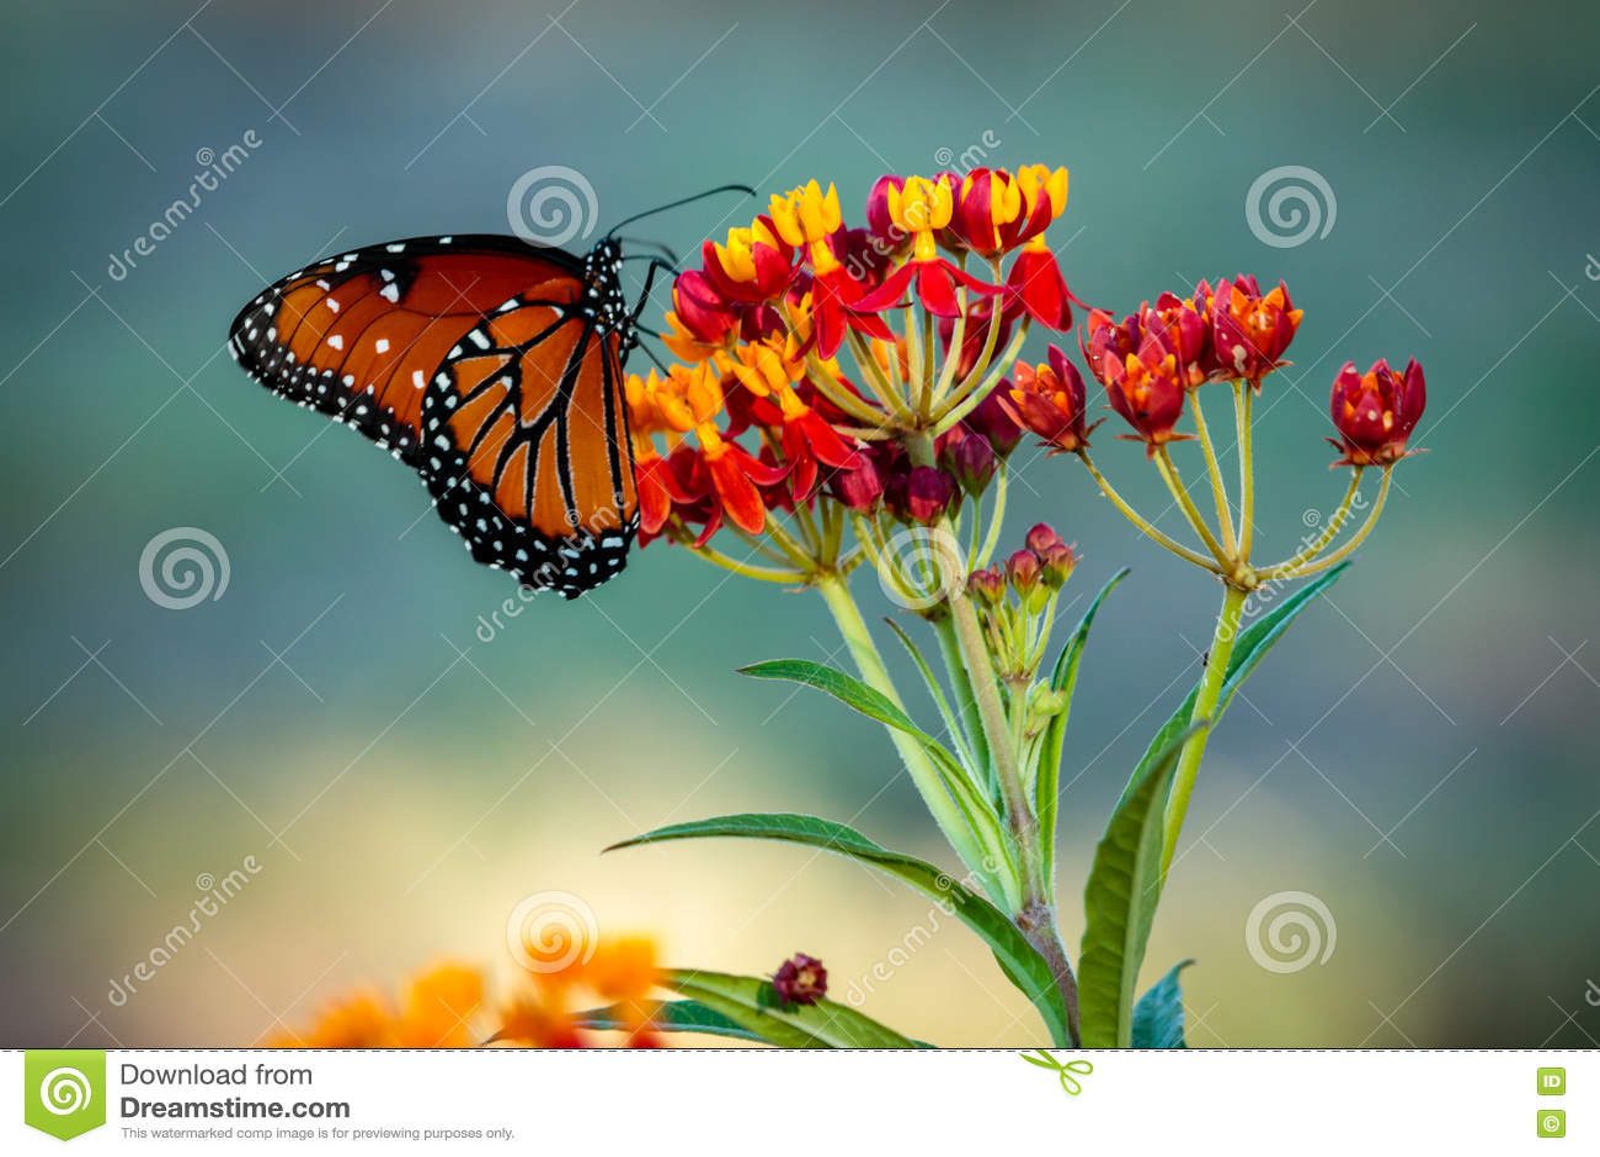 Monarch Butterfly On A Butterfly Bush Stock Photo